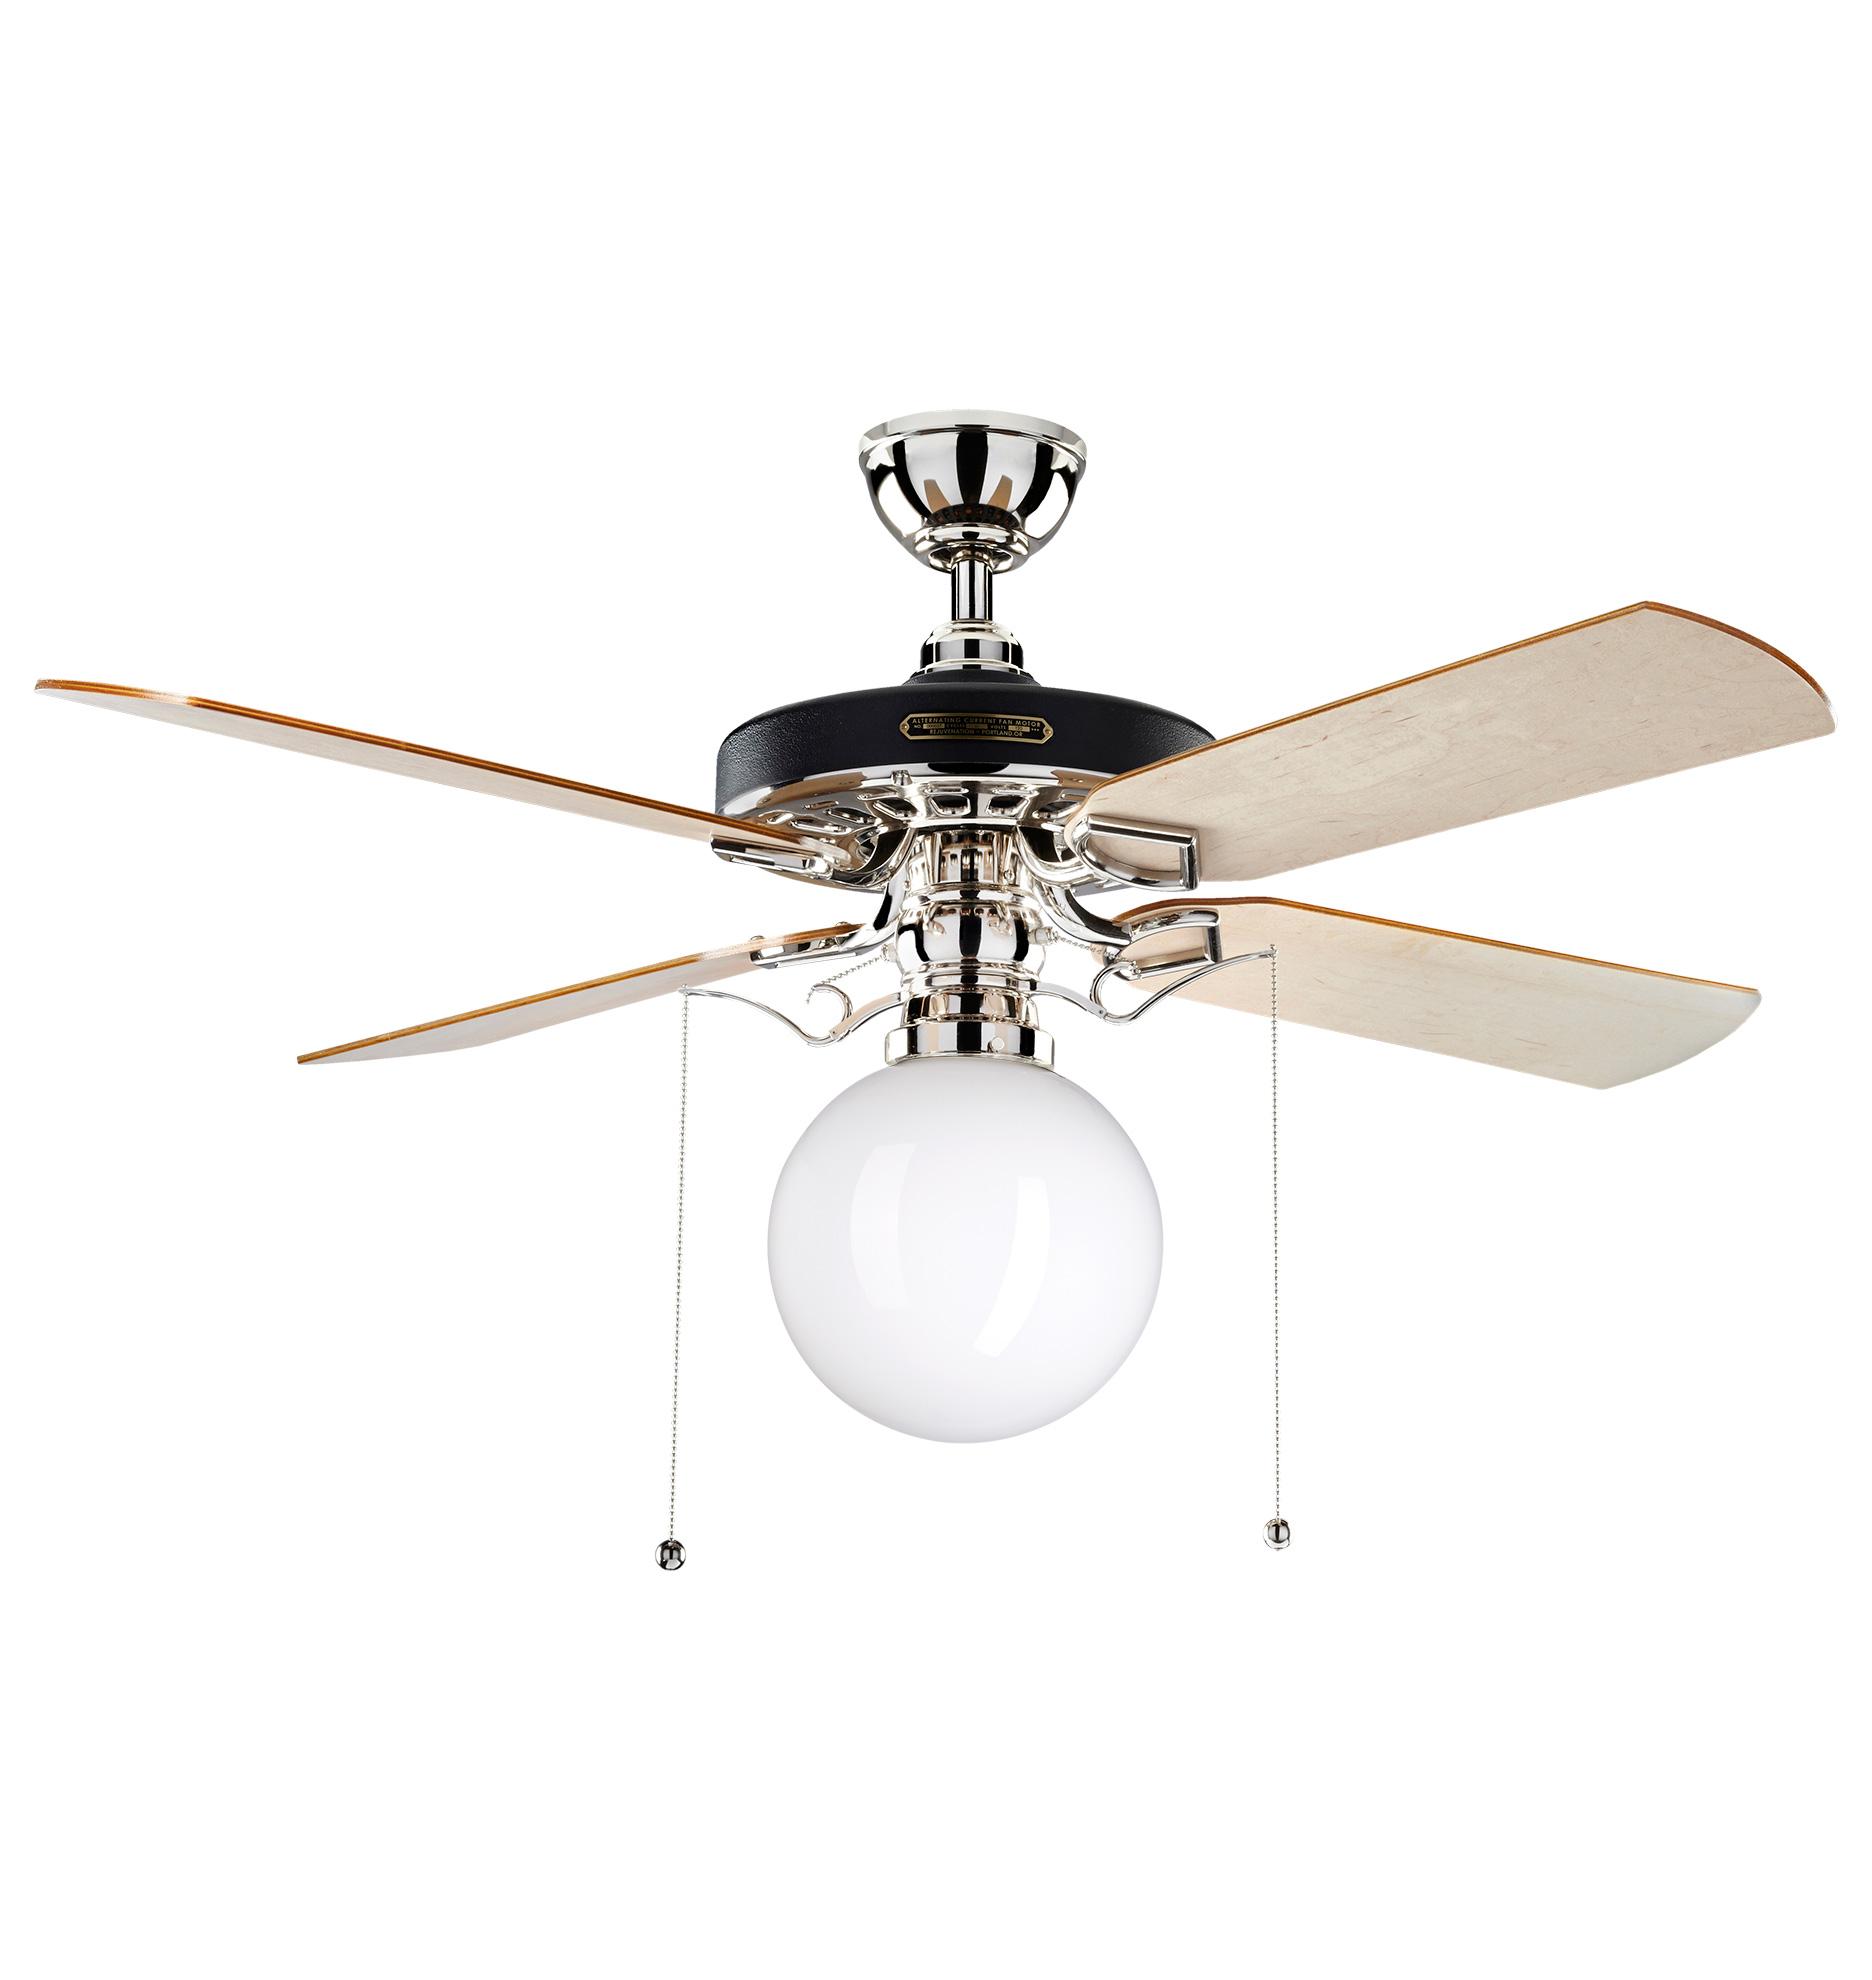 Heron Ceiling Fan With Opal Globe Shade 4 Blade Ceiling Fan with